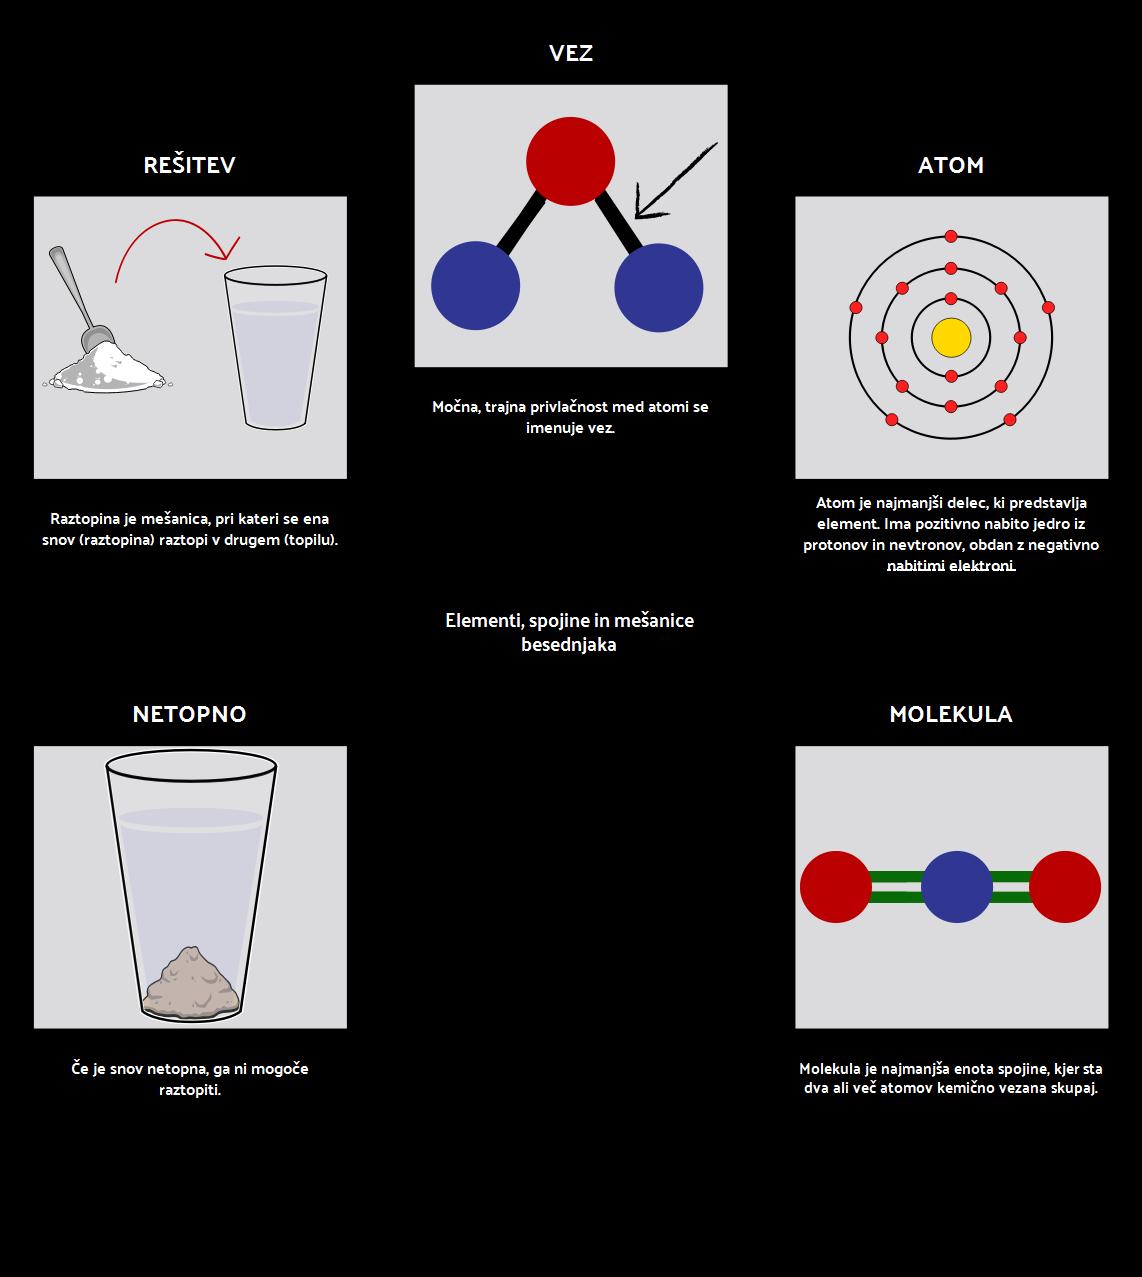 Elementi, Spojine in Mešanice Besednjaka